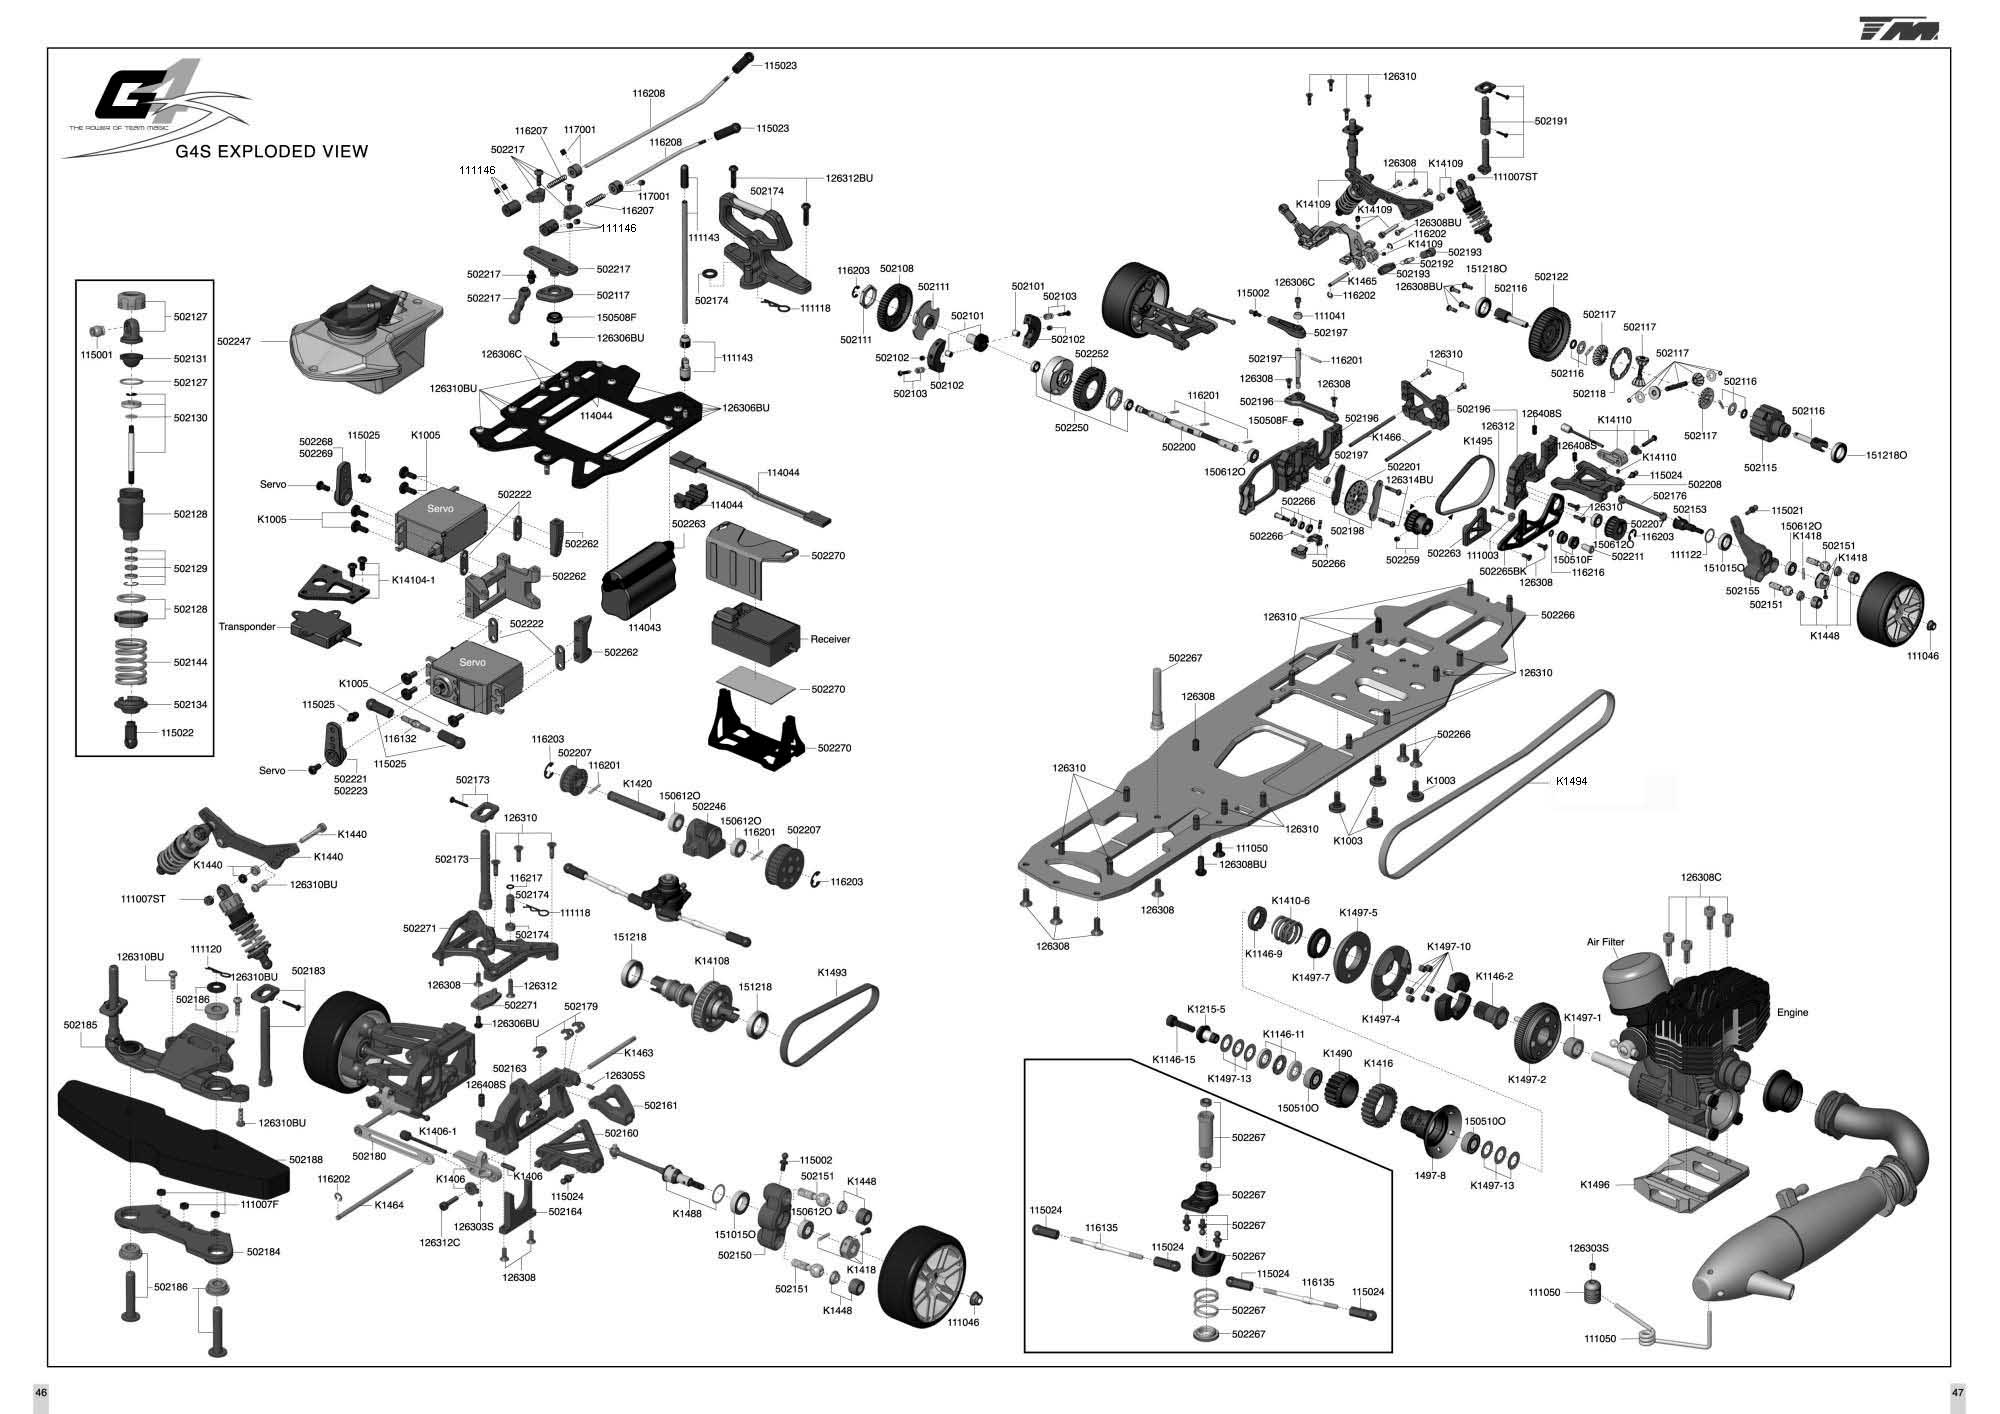 hight resolution of hpi 4 6 max parts diagram wiring diagram dat hpi 4 6 max parts diagram wiring